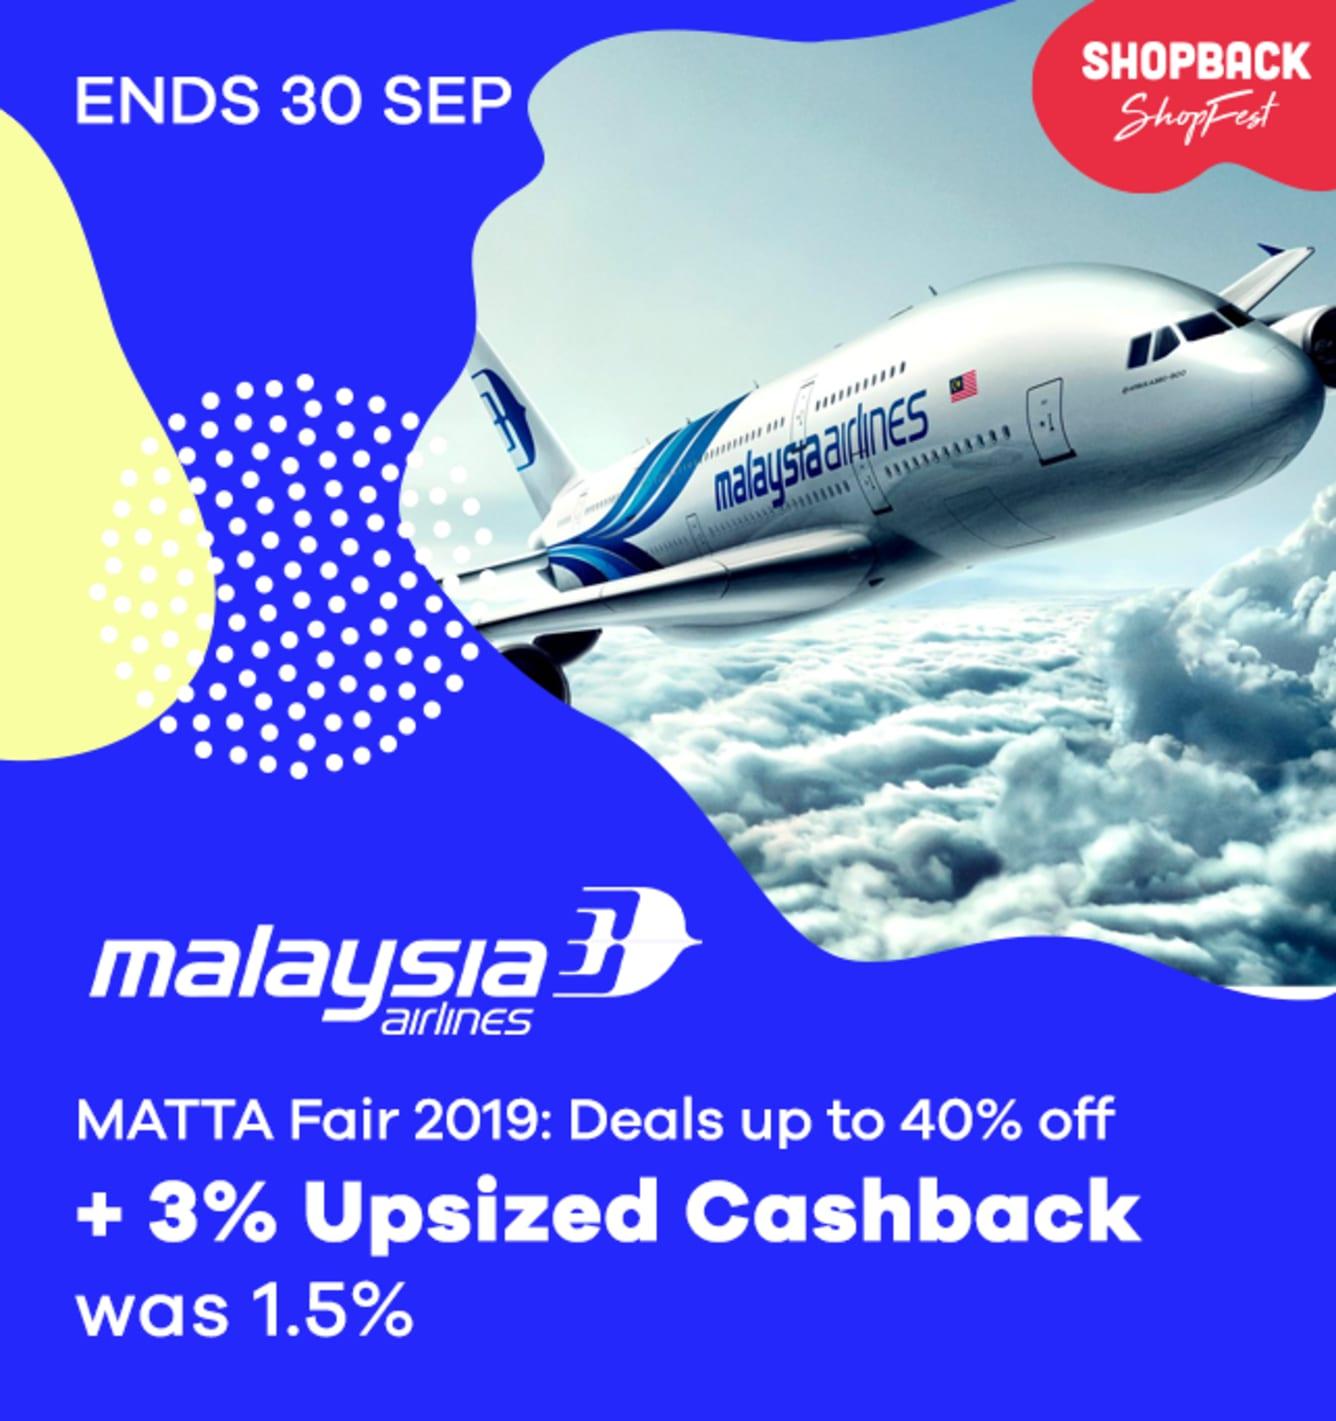 Malaysia Airlines Upsized Cashback